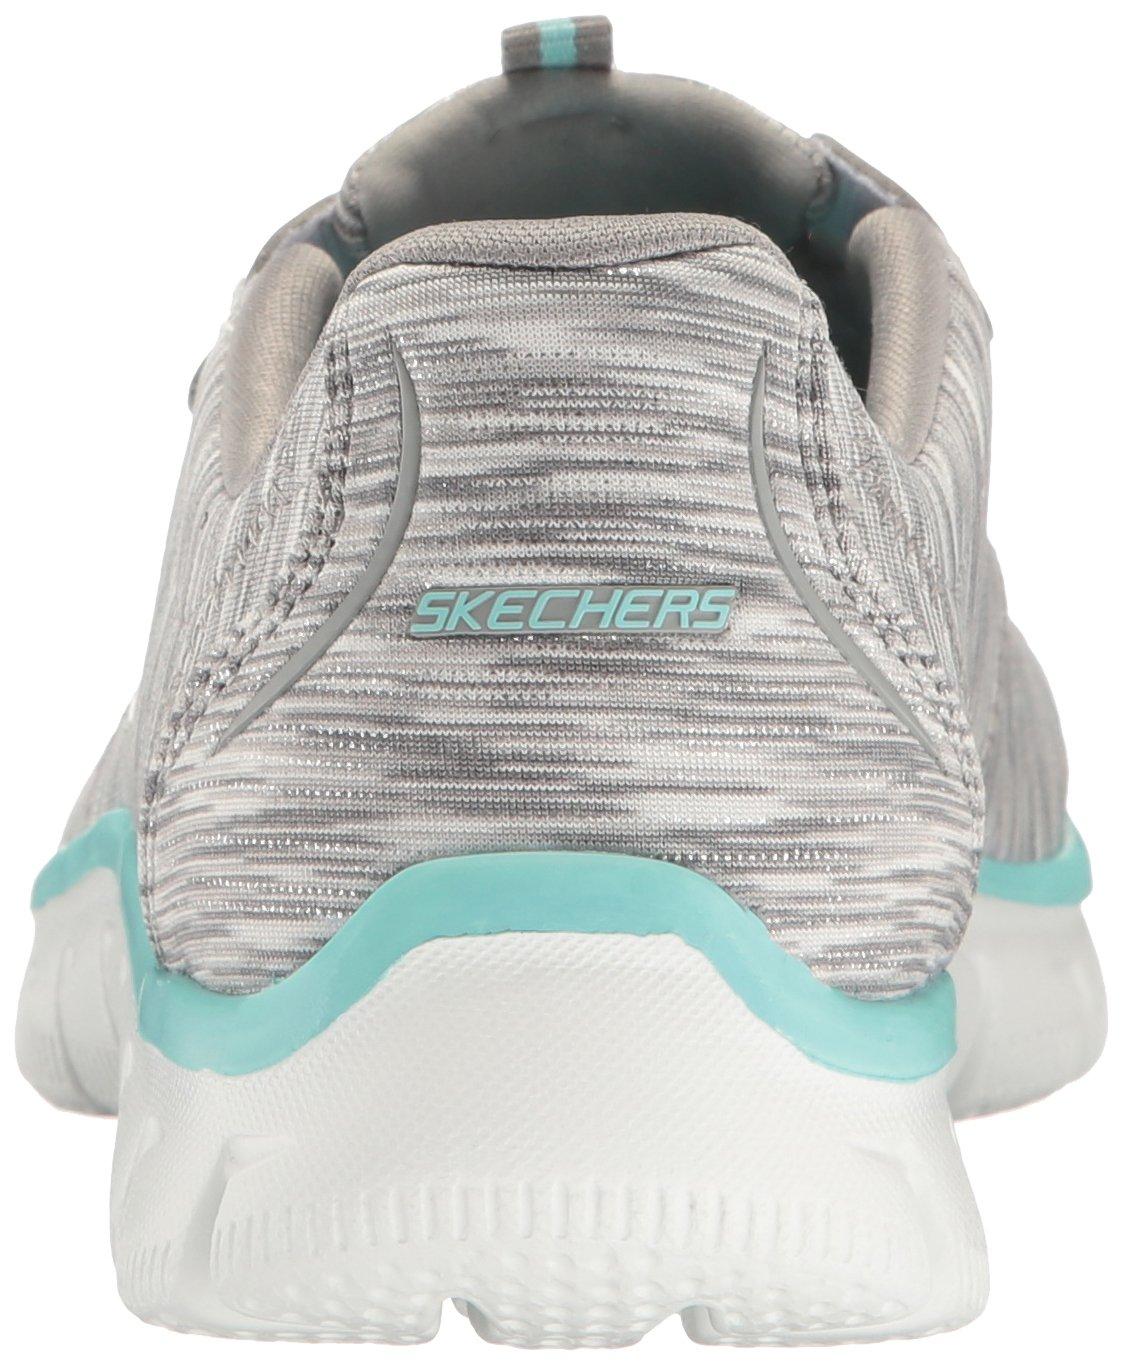 Skechers Women's Sport Empire - Rock Around Relaxed Fit Fashion Sneaker, Gray/Light Blue, 9 B(M) US by Skechers (Image #2)